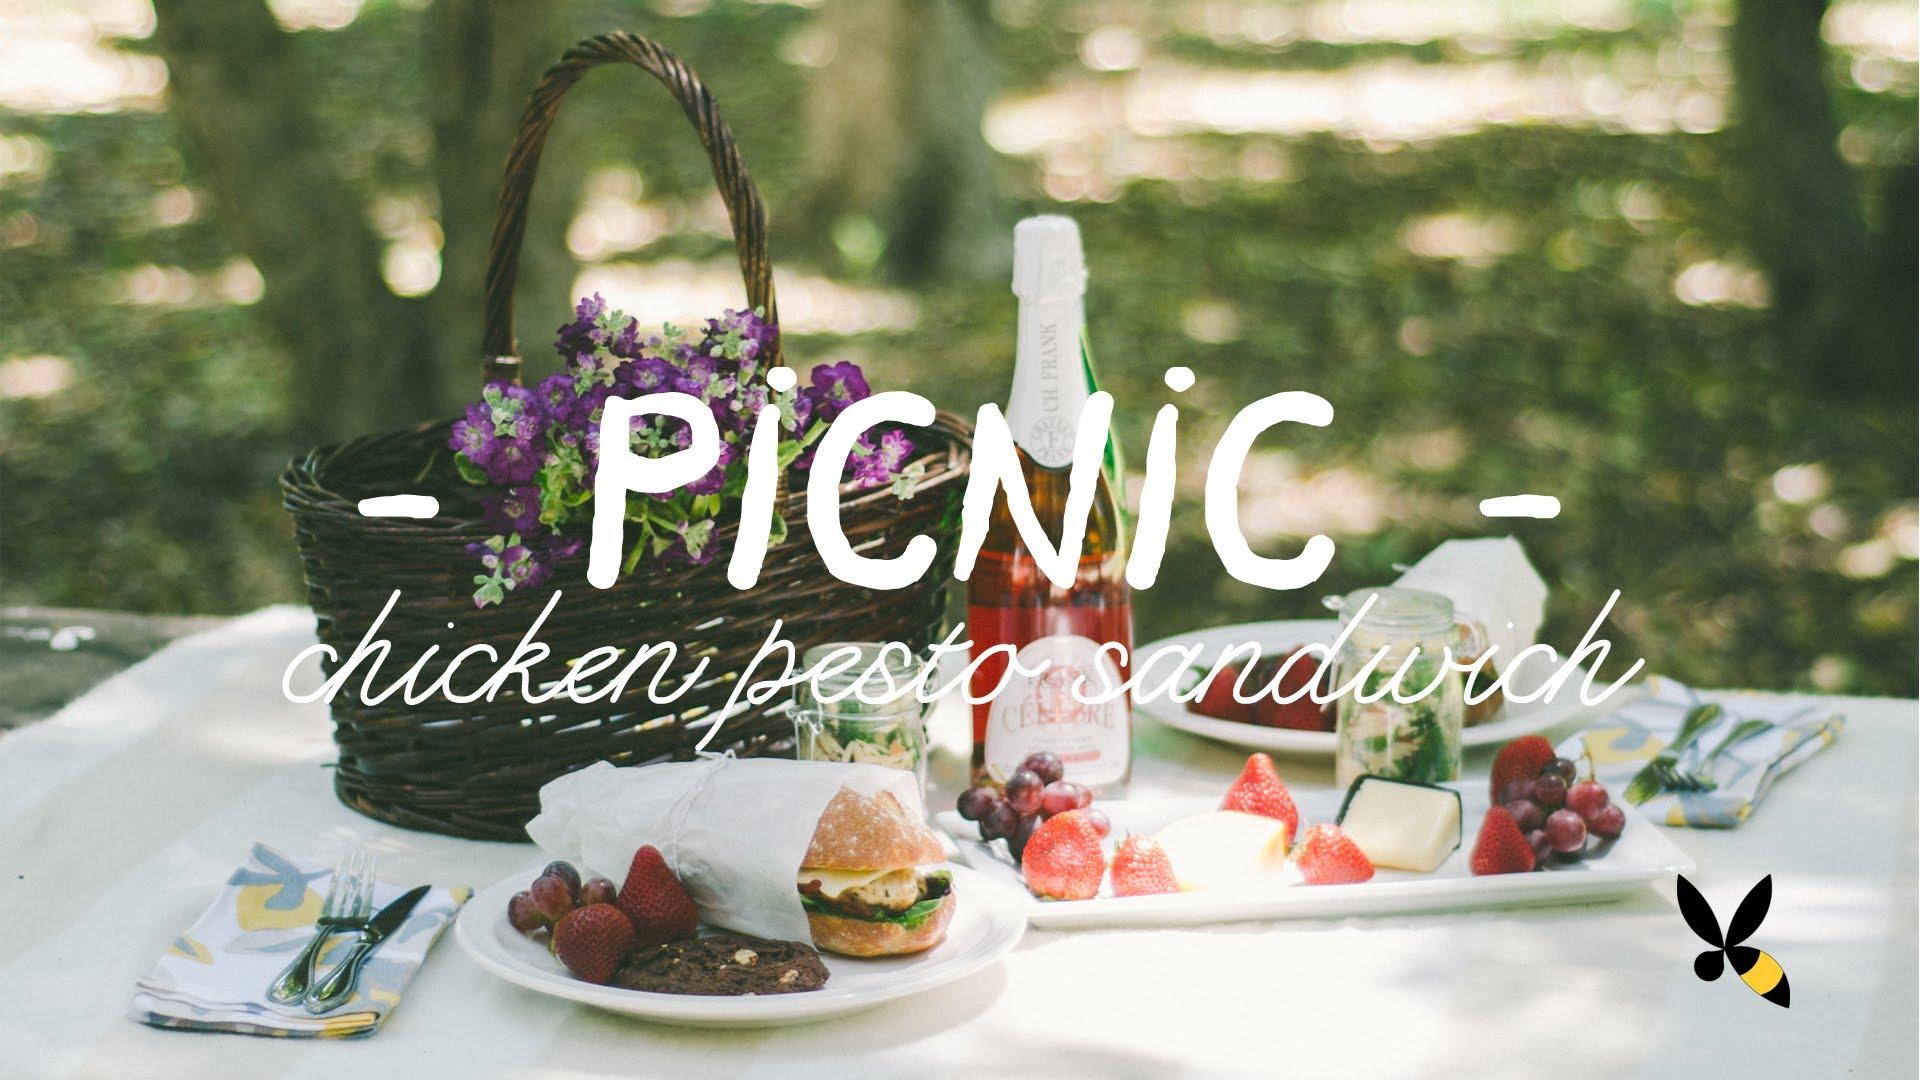 「這個周末,一起浪漫野餐趣!」- Picnic Ideas - HoneysuckleCatering